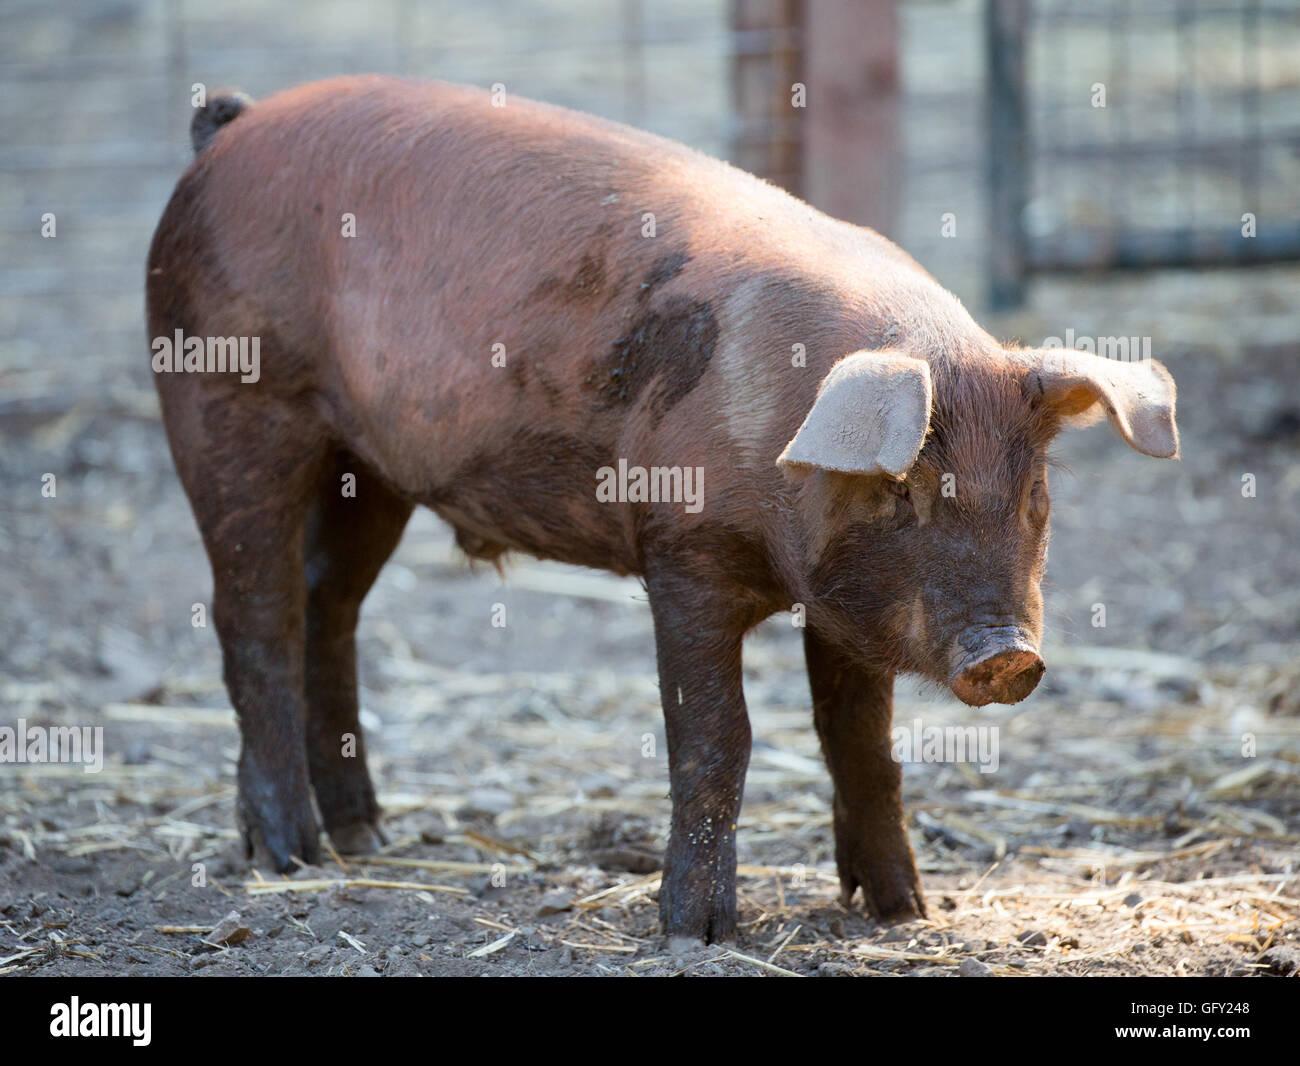 Pig Breeds Stock Photos & Pig Breeds Stock Images - Alamy